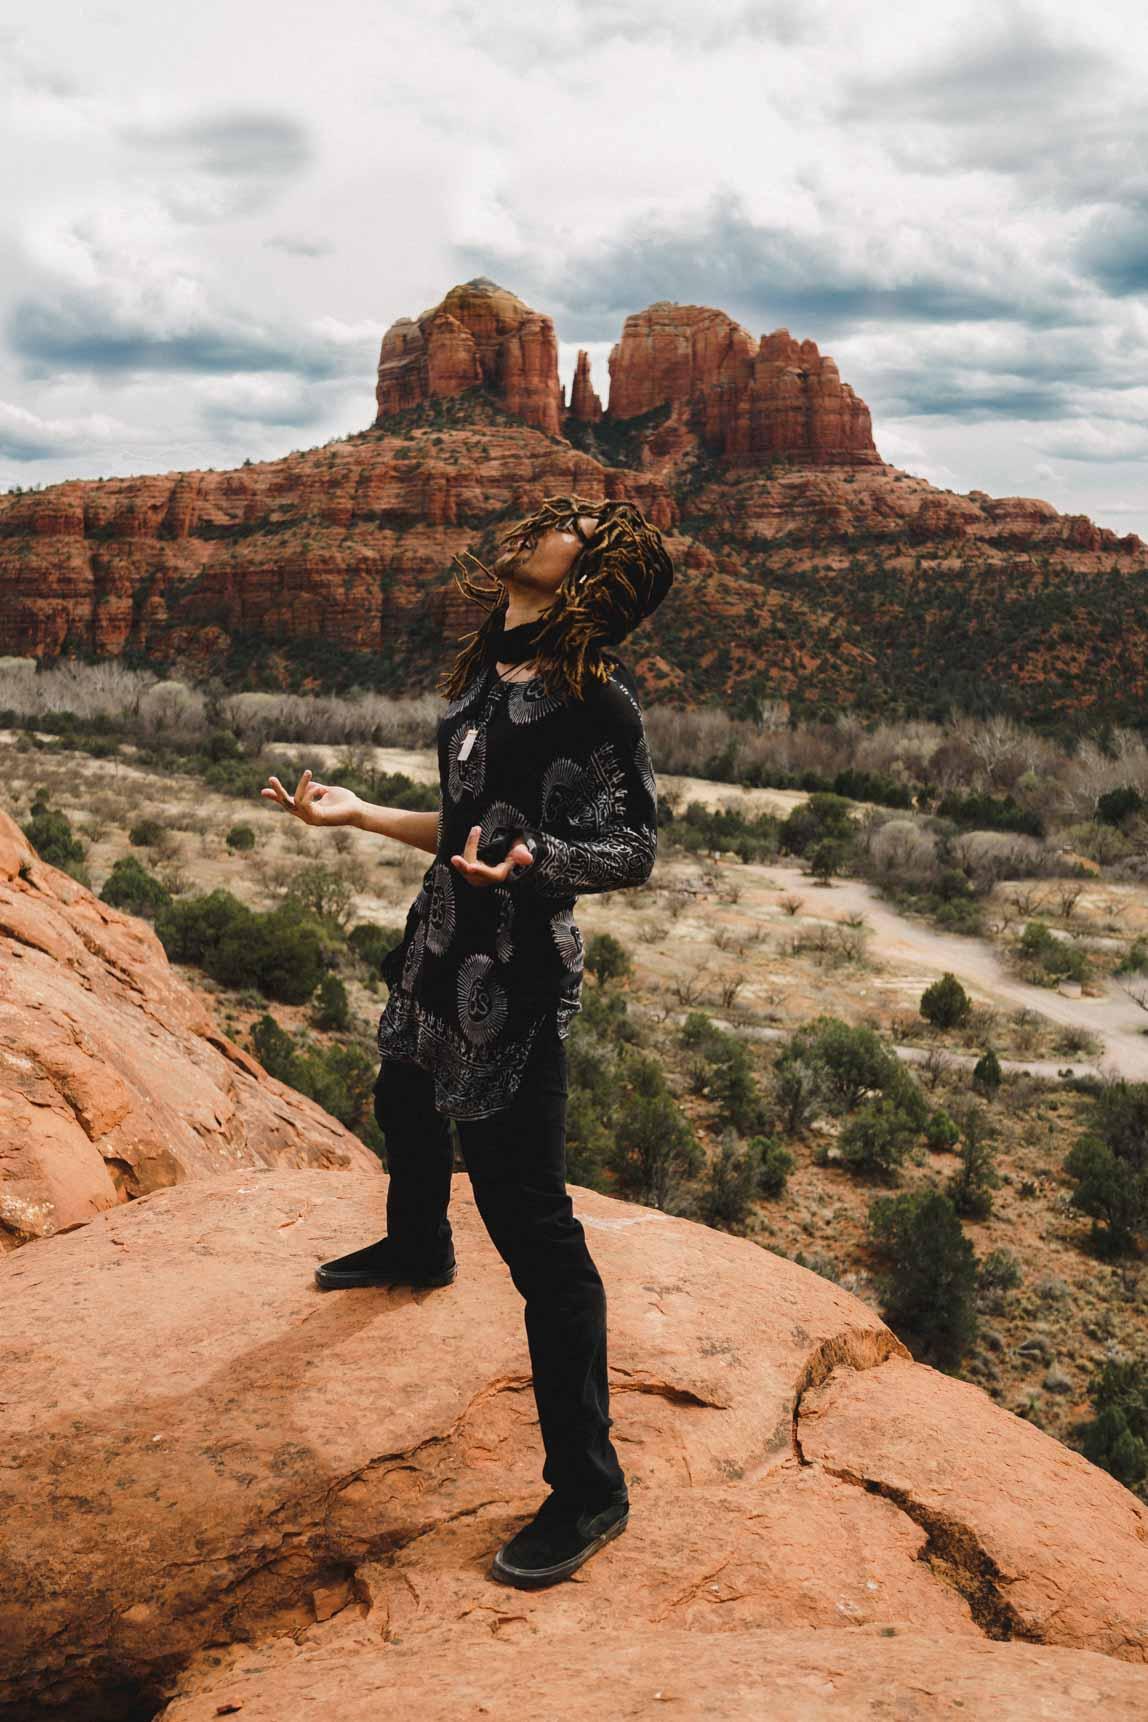 Sedona Arizona Modeled by Aaron Wiggins  Photo by Jas Gold Jason Goldsmith Shot with Sony A7ii and Carl Zeiss 35 1.4